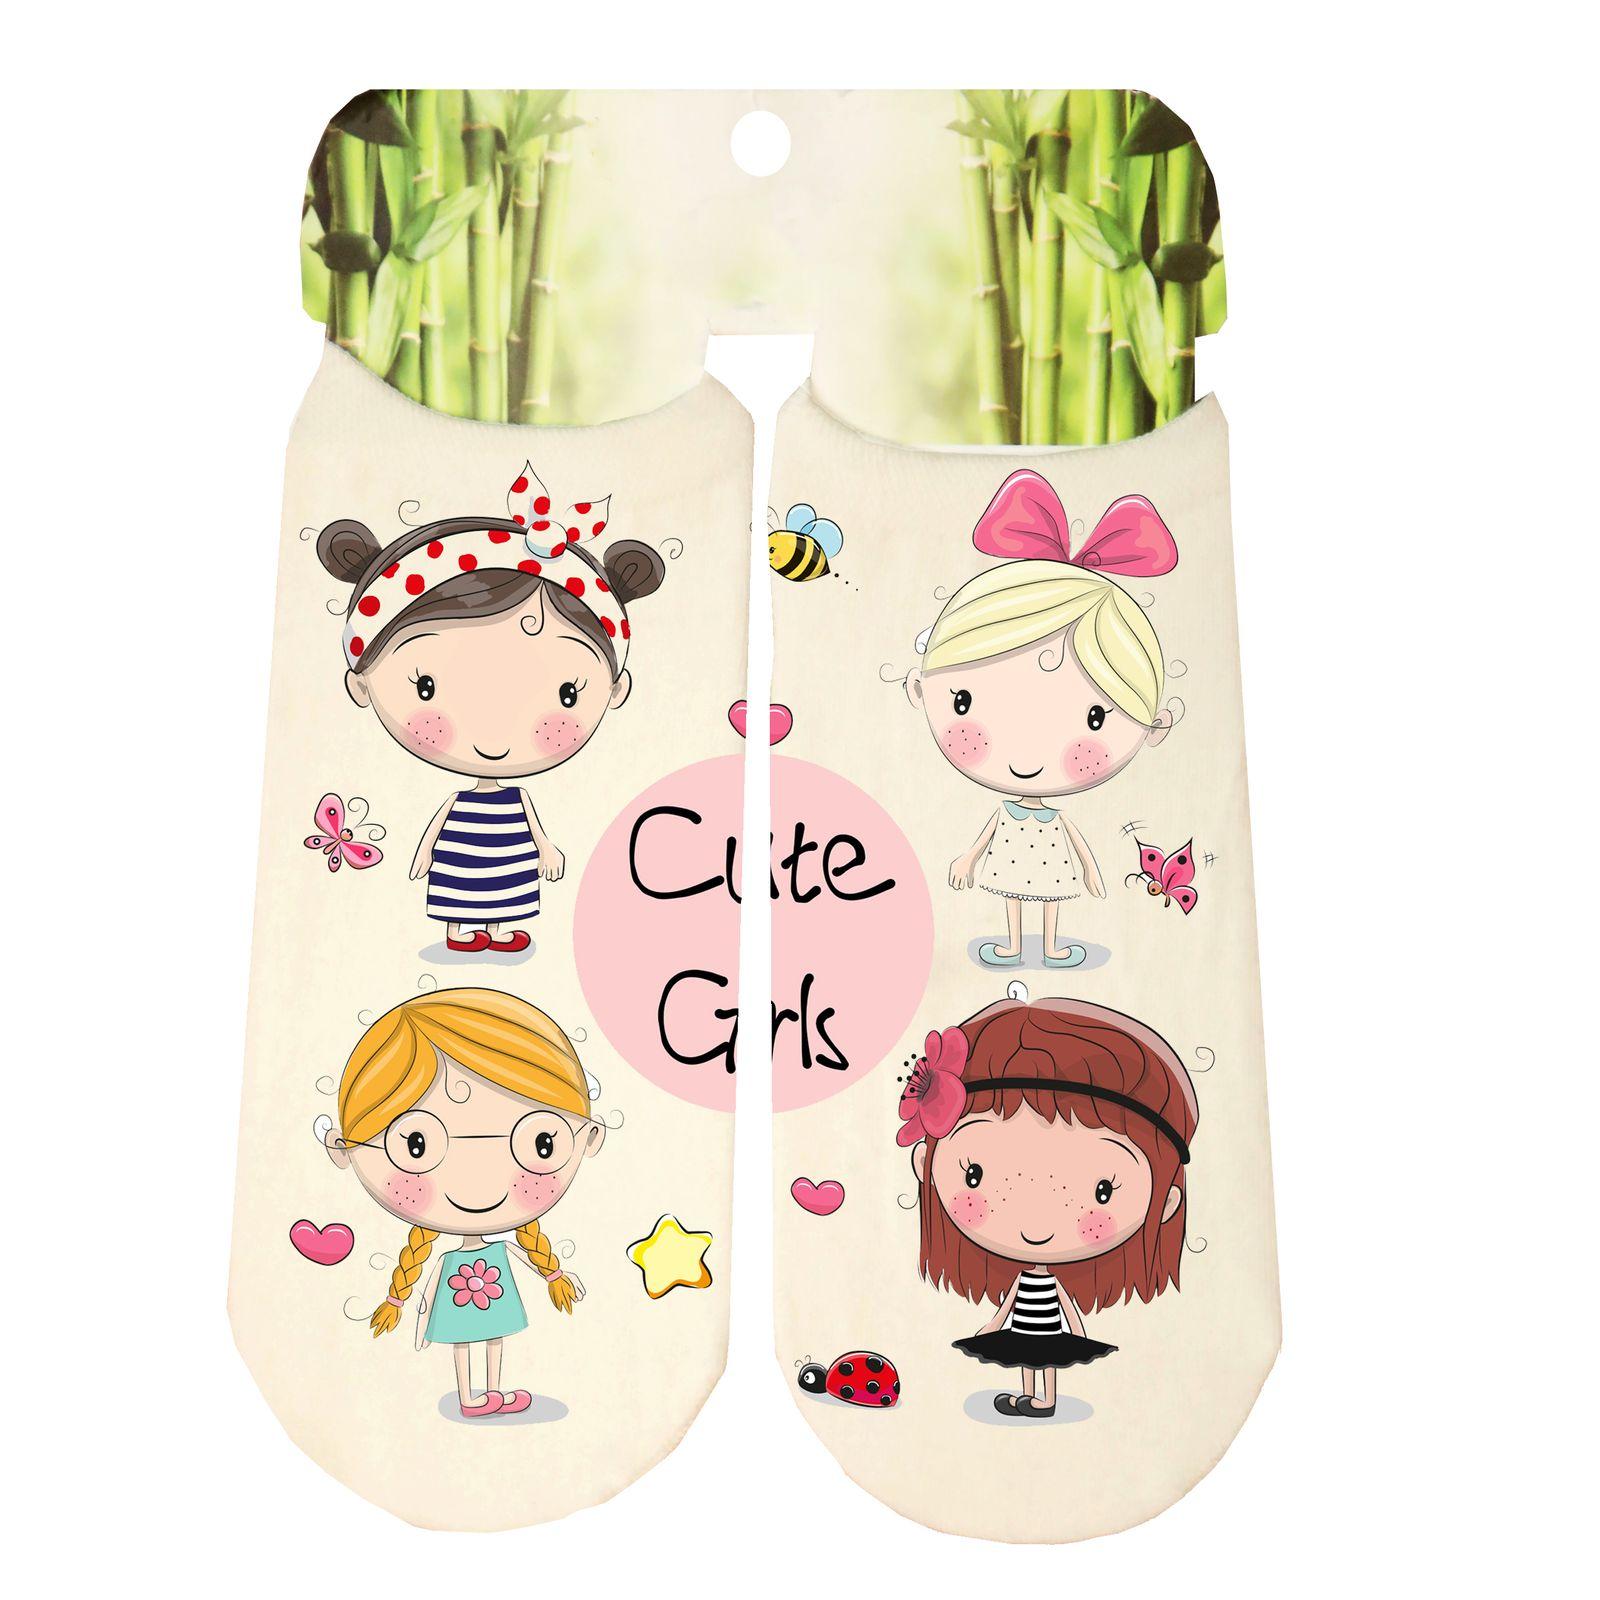 جوراب دخترانه طرح دختر کد SCb51 -  - 2